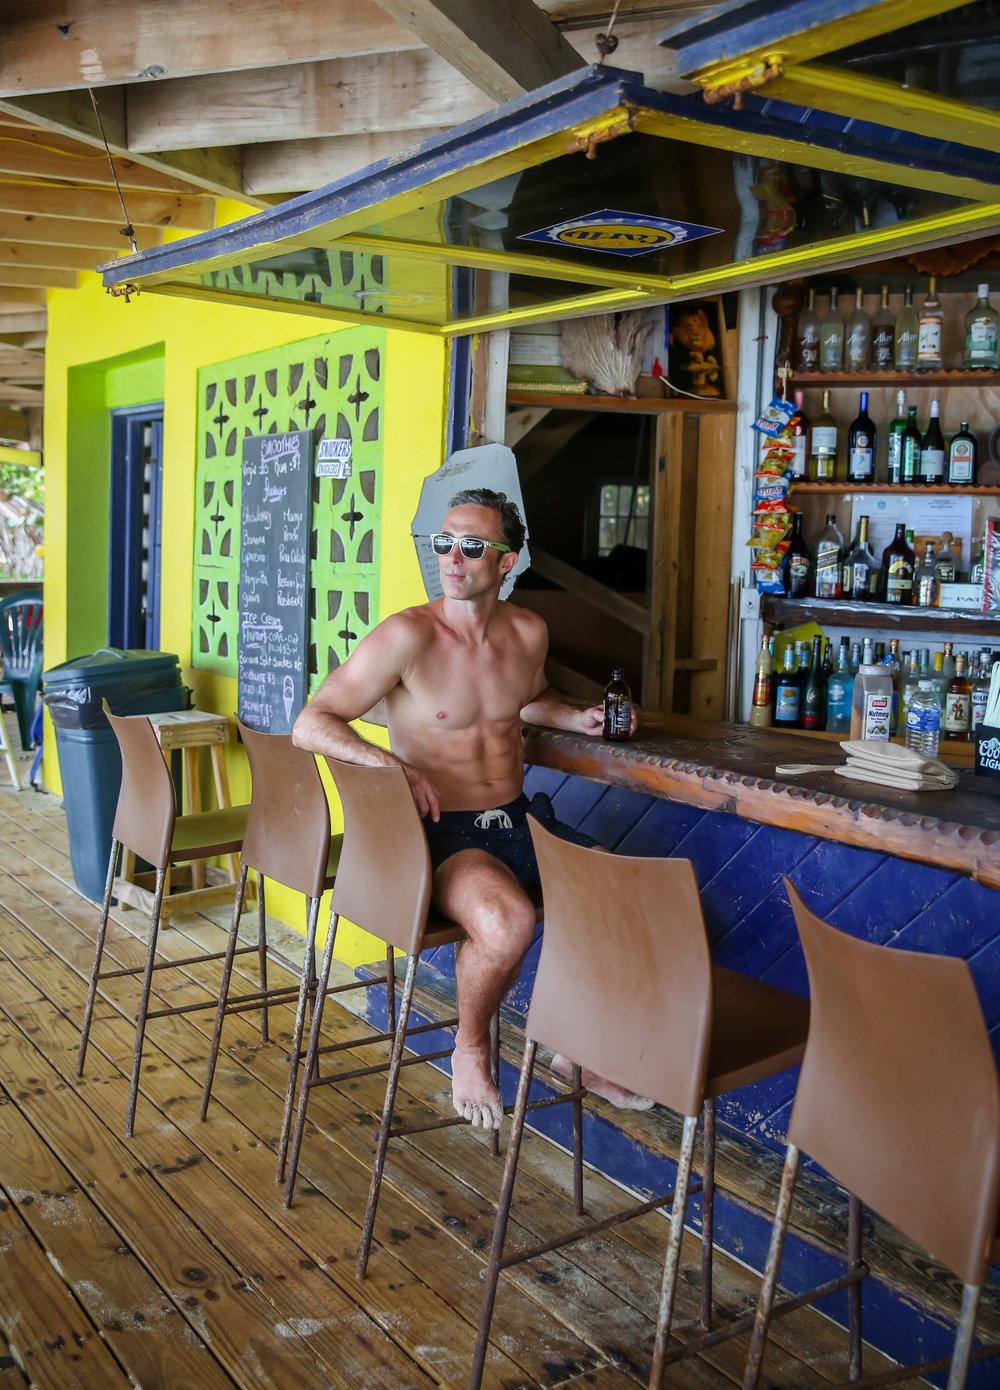 josiahs-bay-beach-bar-tortola-lauren-schwaiger-travel-blog.jpg